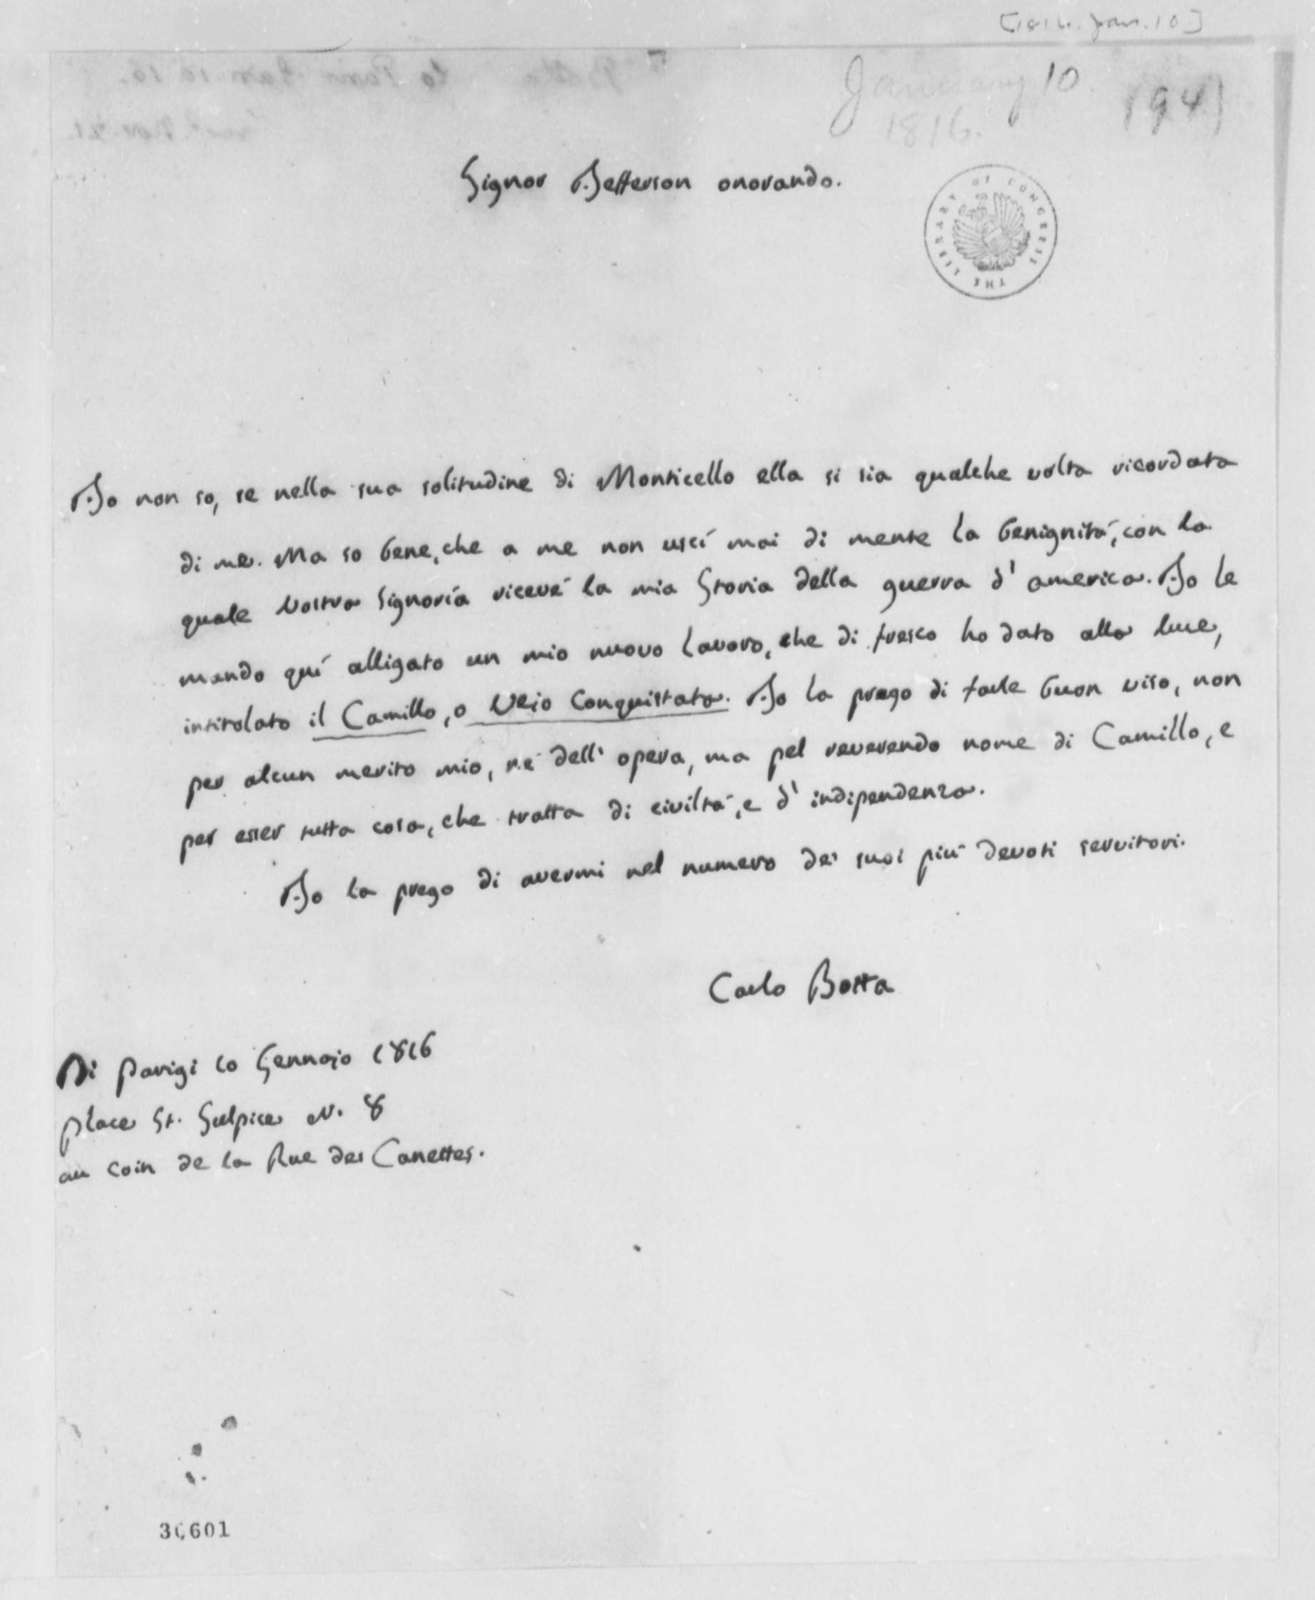 Charles G. G. Botta to Thomas Jefferson, January 10, 1816, in Italian